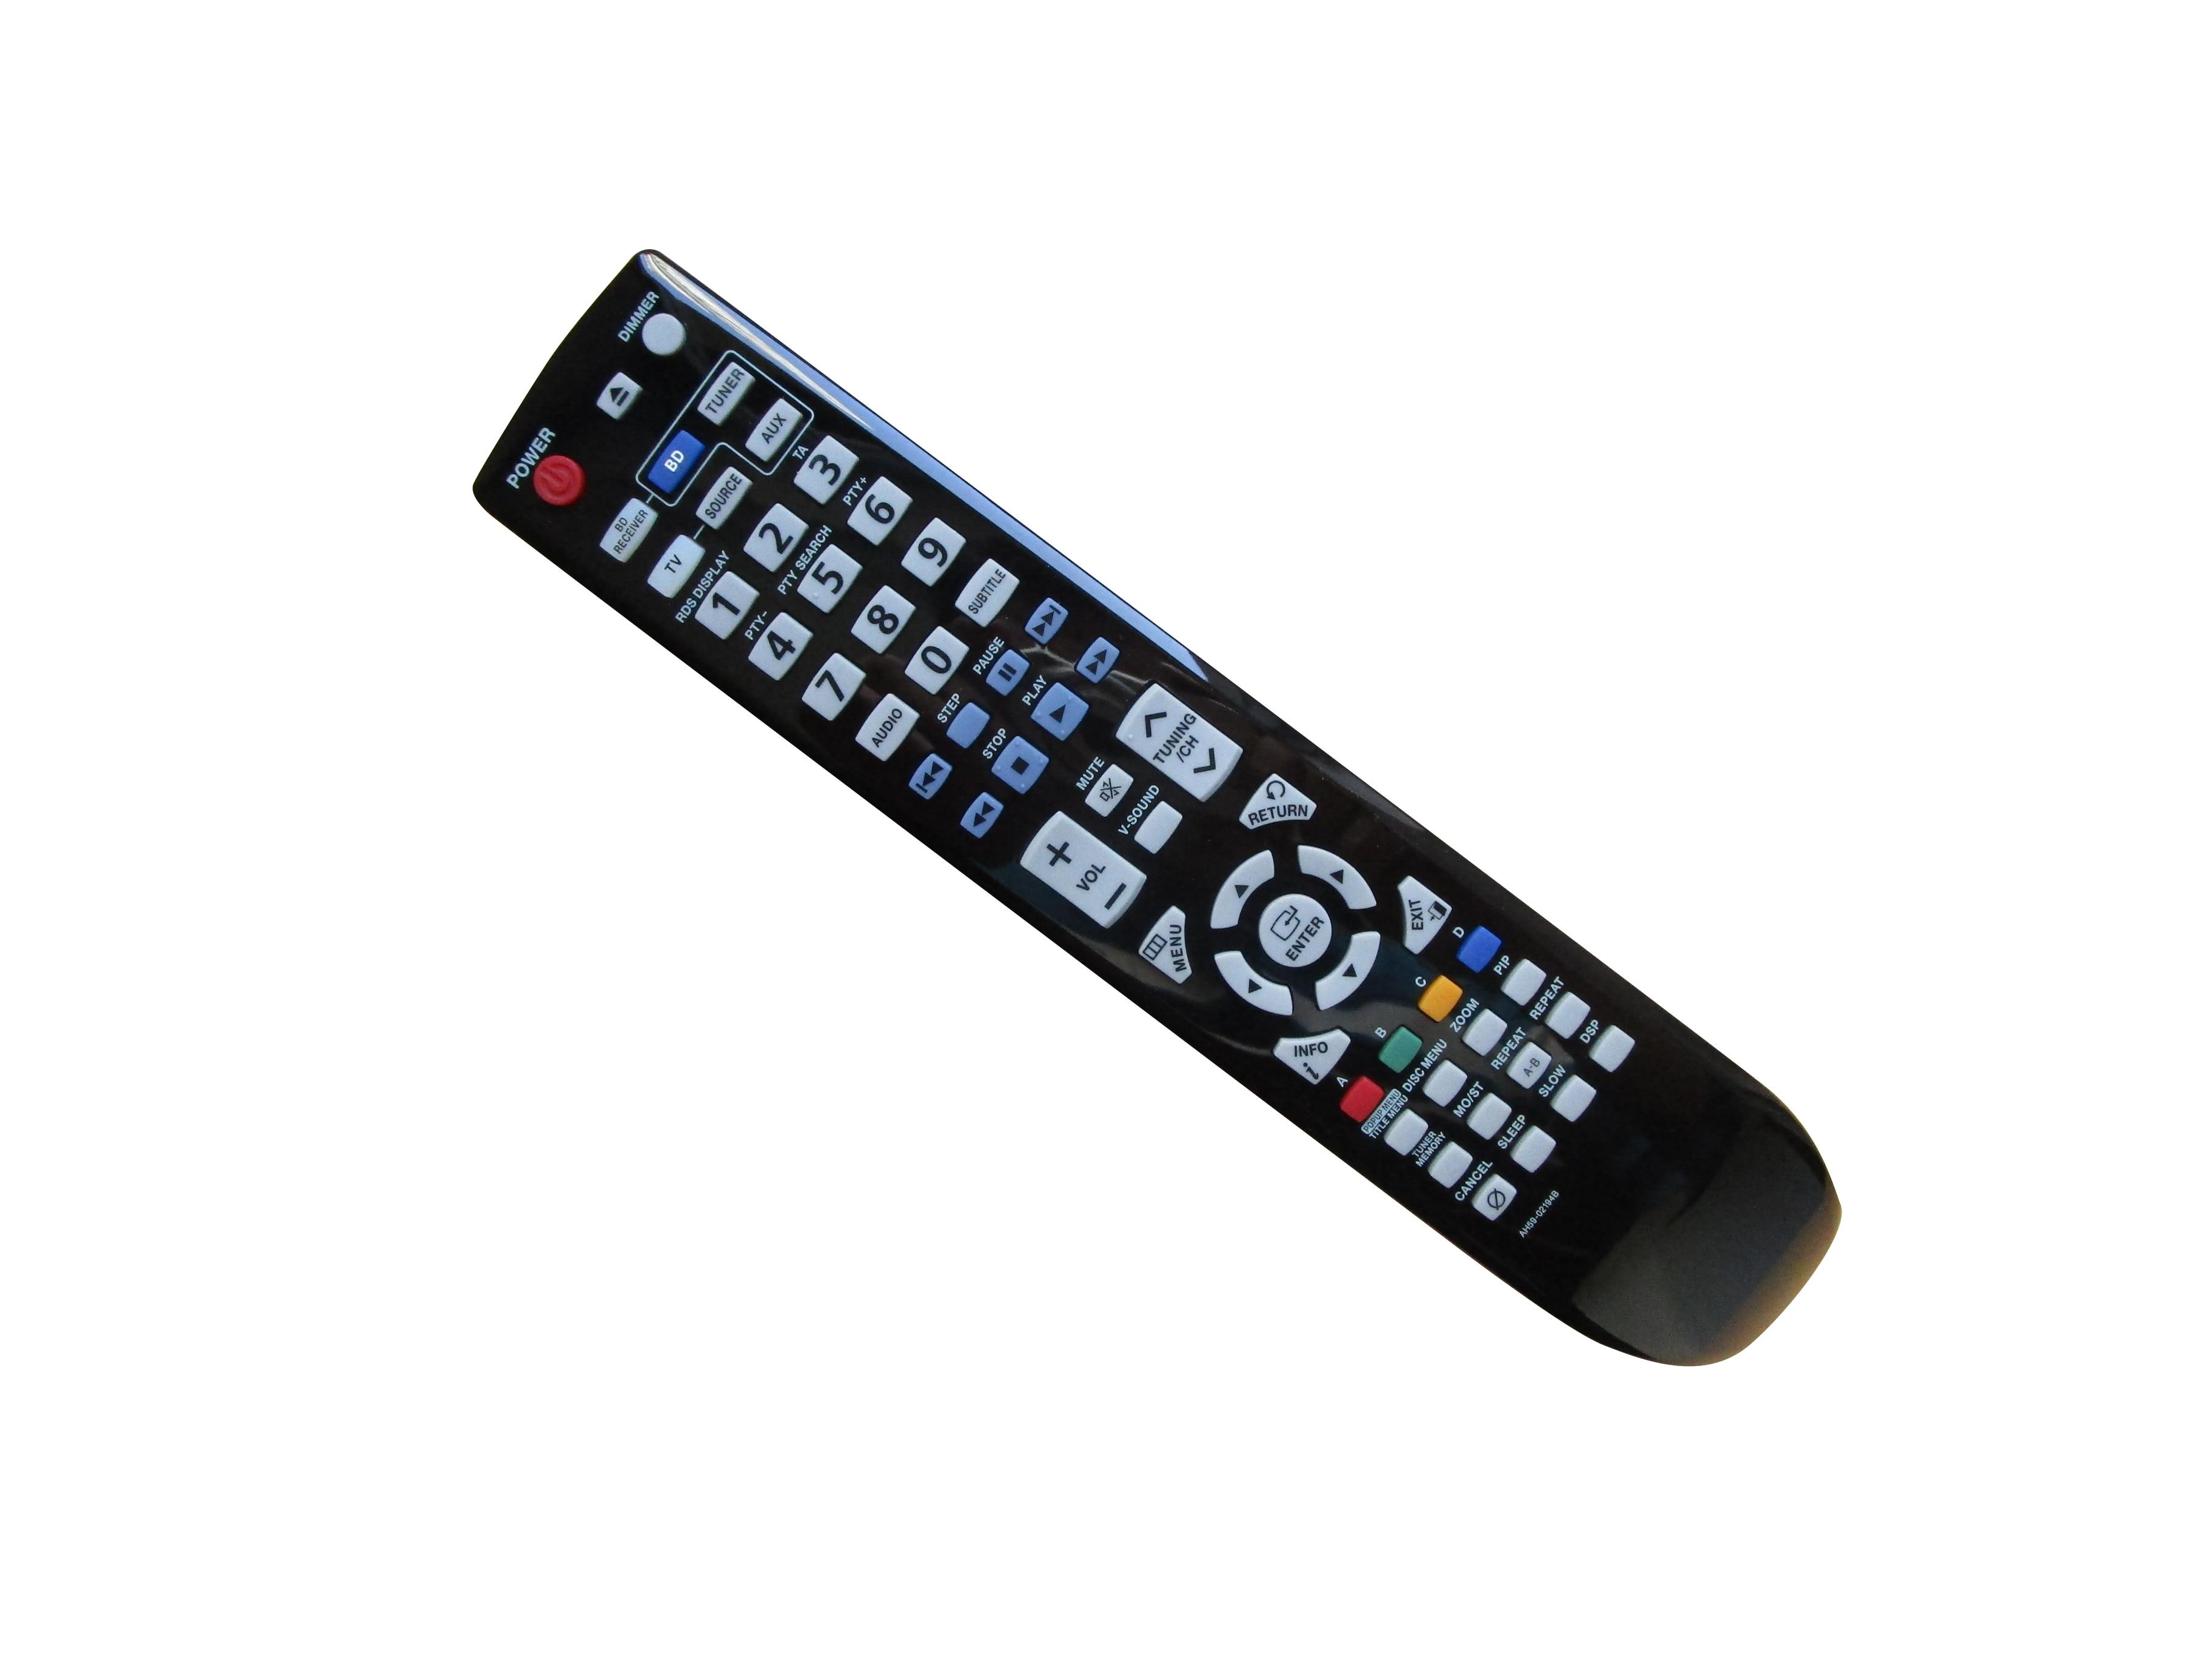 Remote Control For Samsung AH59-02144K HT-BD7200 HT-BD8200 AH59-02195A AH59-02131U HT-BD1150 AH59-02194A DVD Home Theater System